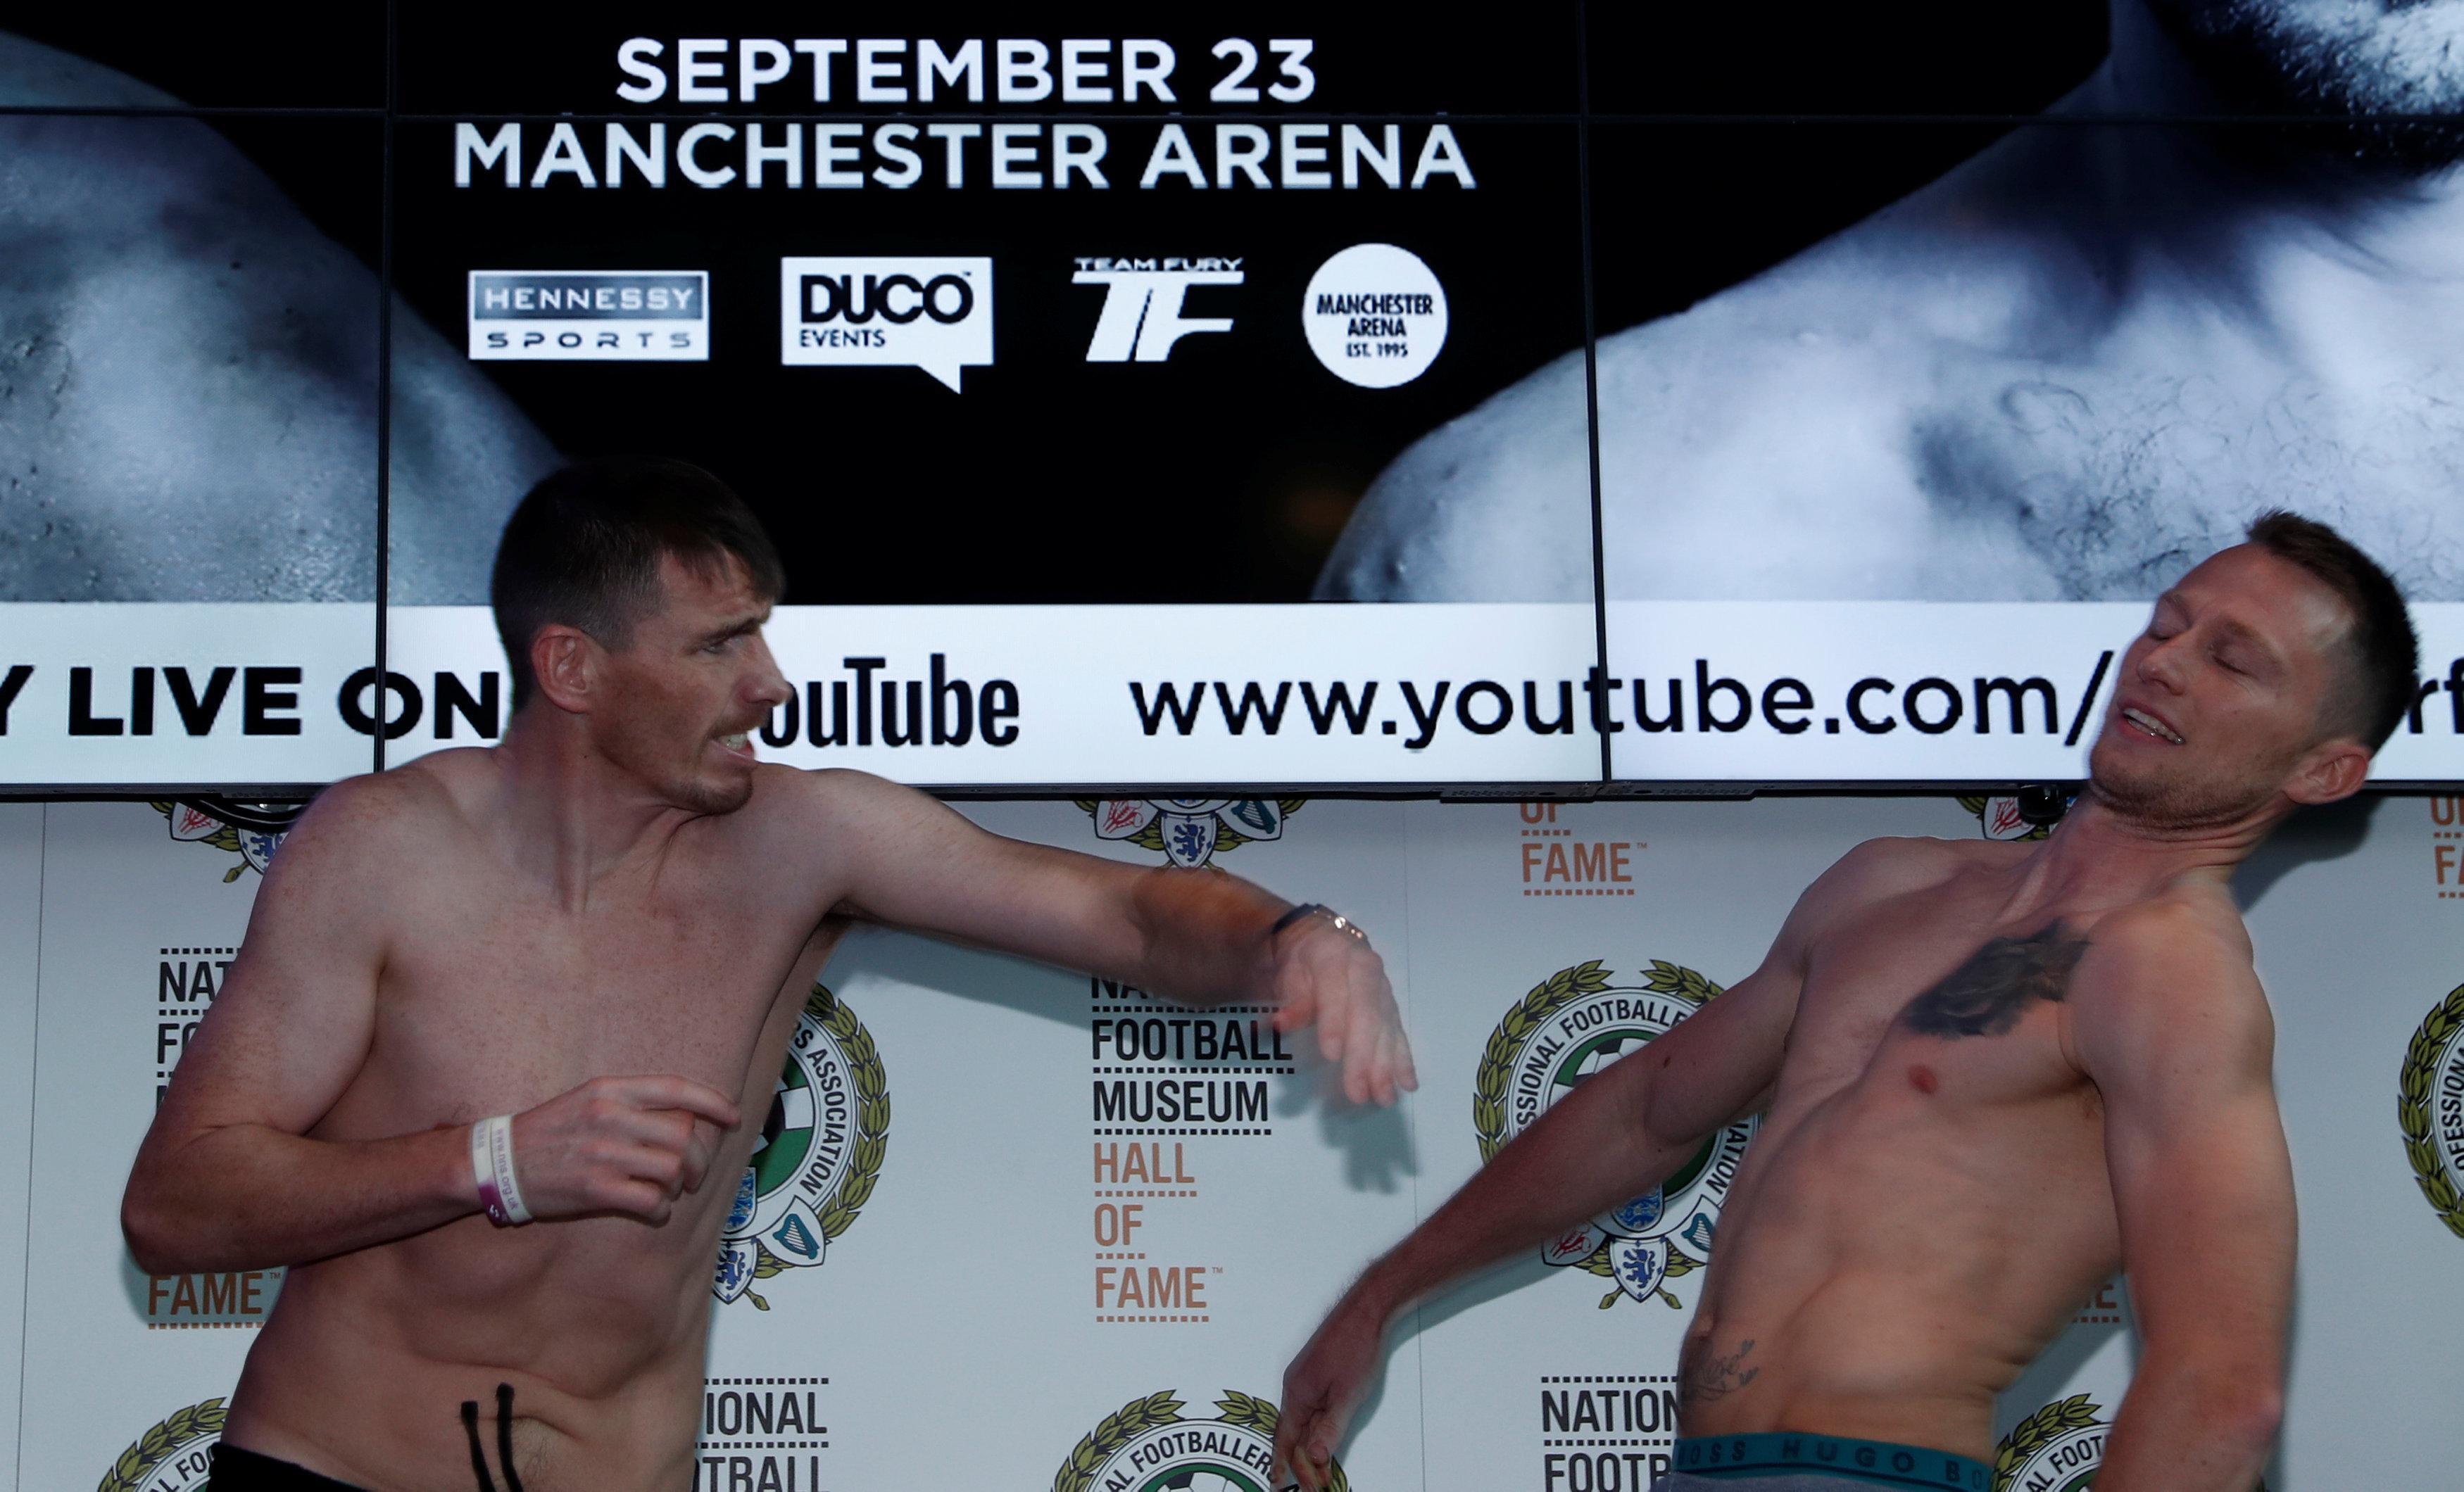 Peter Mcdonagh Lands Punch On Rival Shayne Singleton At